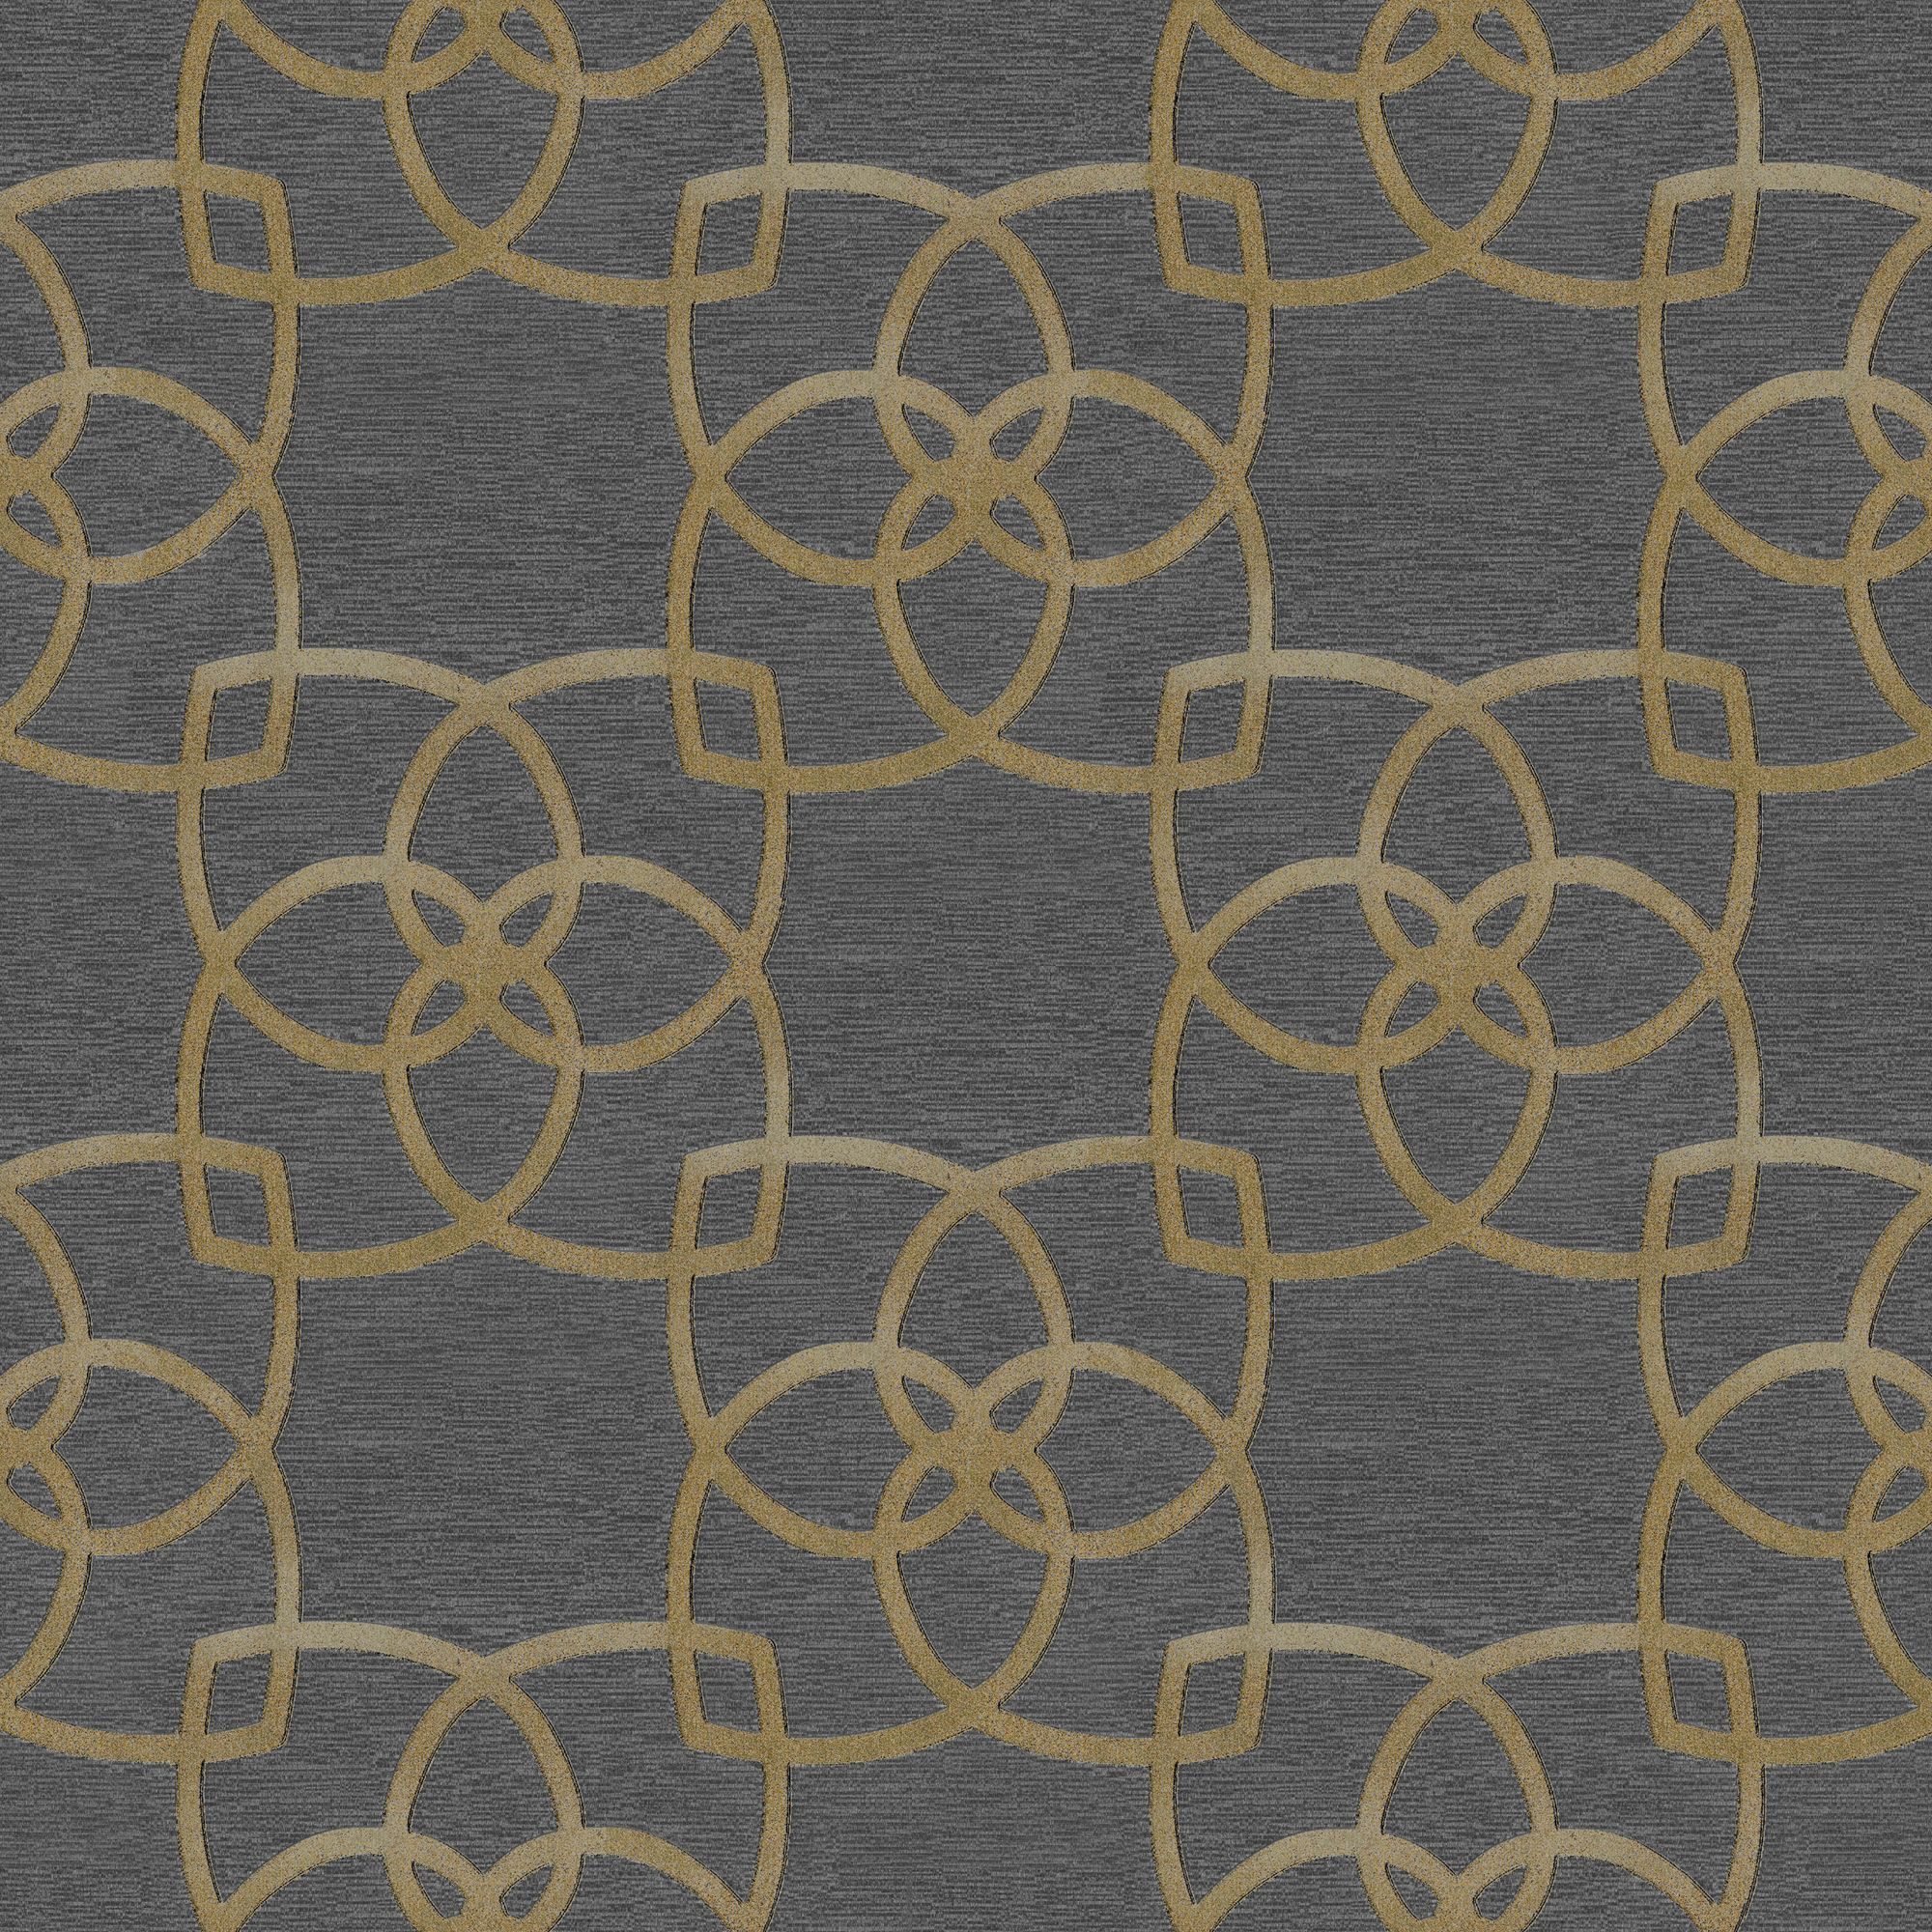 Muriva Precious Silks Warm Gold & Silver Geometric